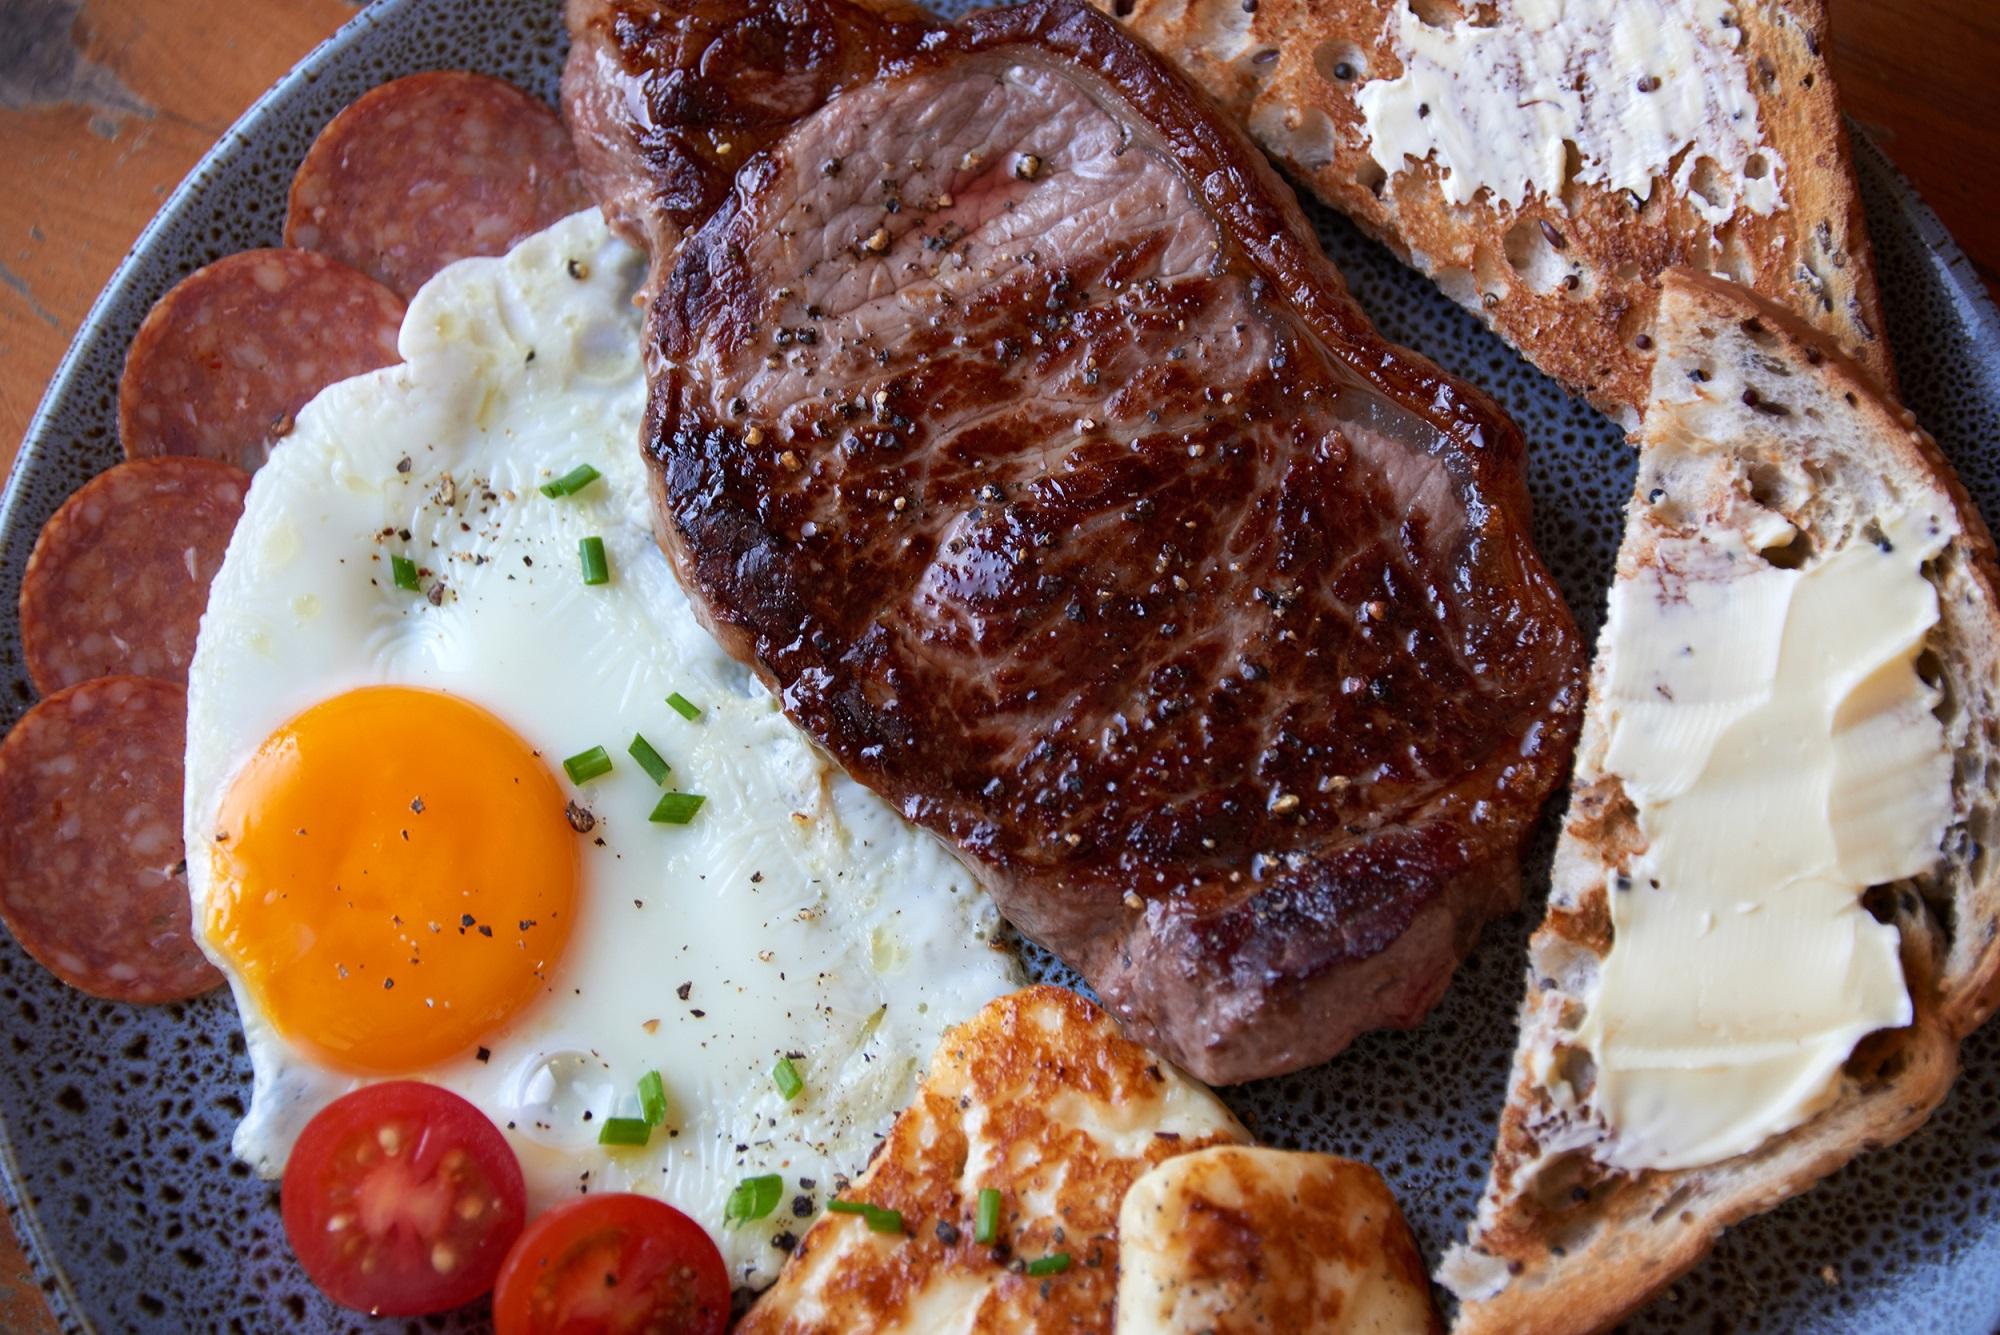 Order the Steak